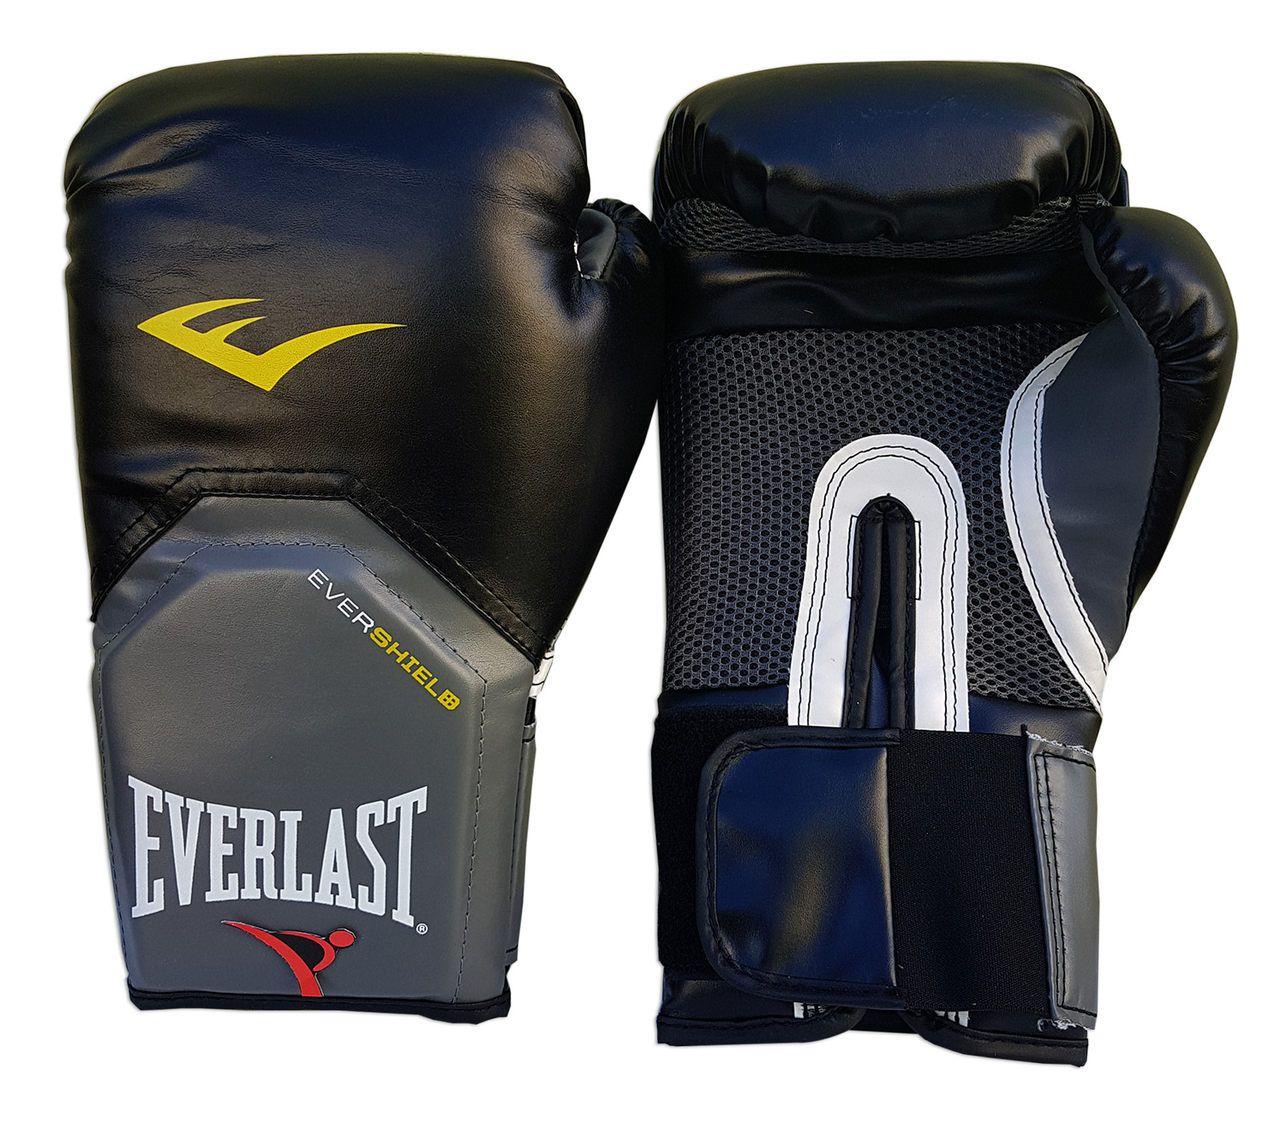 Kit de Boxe / Muay Thai 12oz - Preto - Pro Style - Everlast  - PRALUTA SHOP